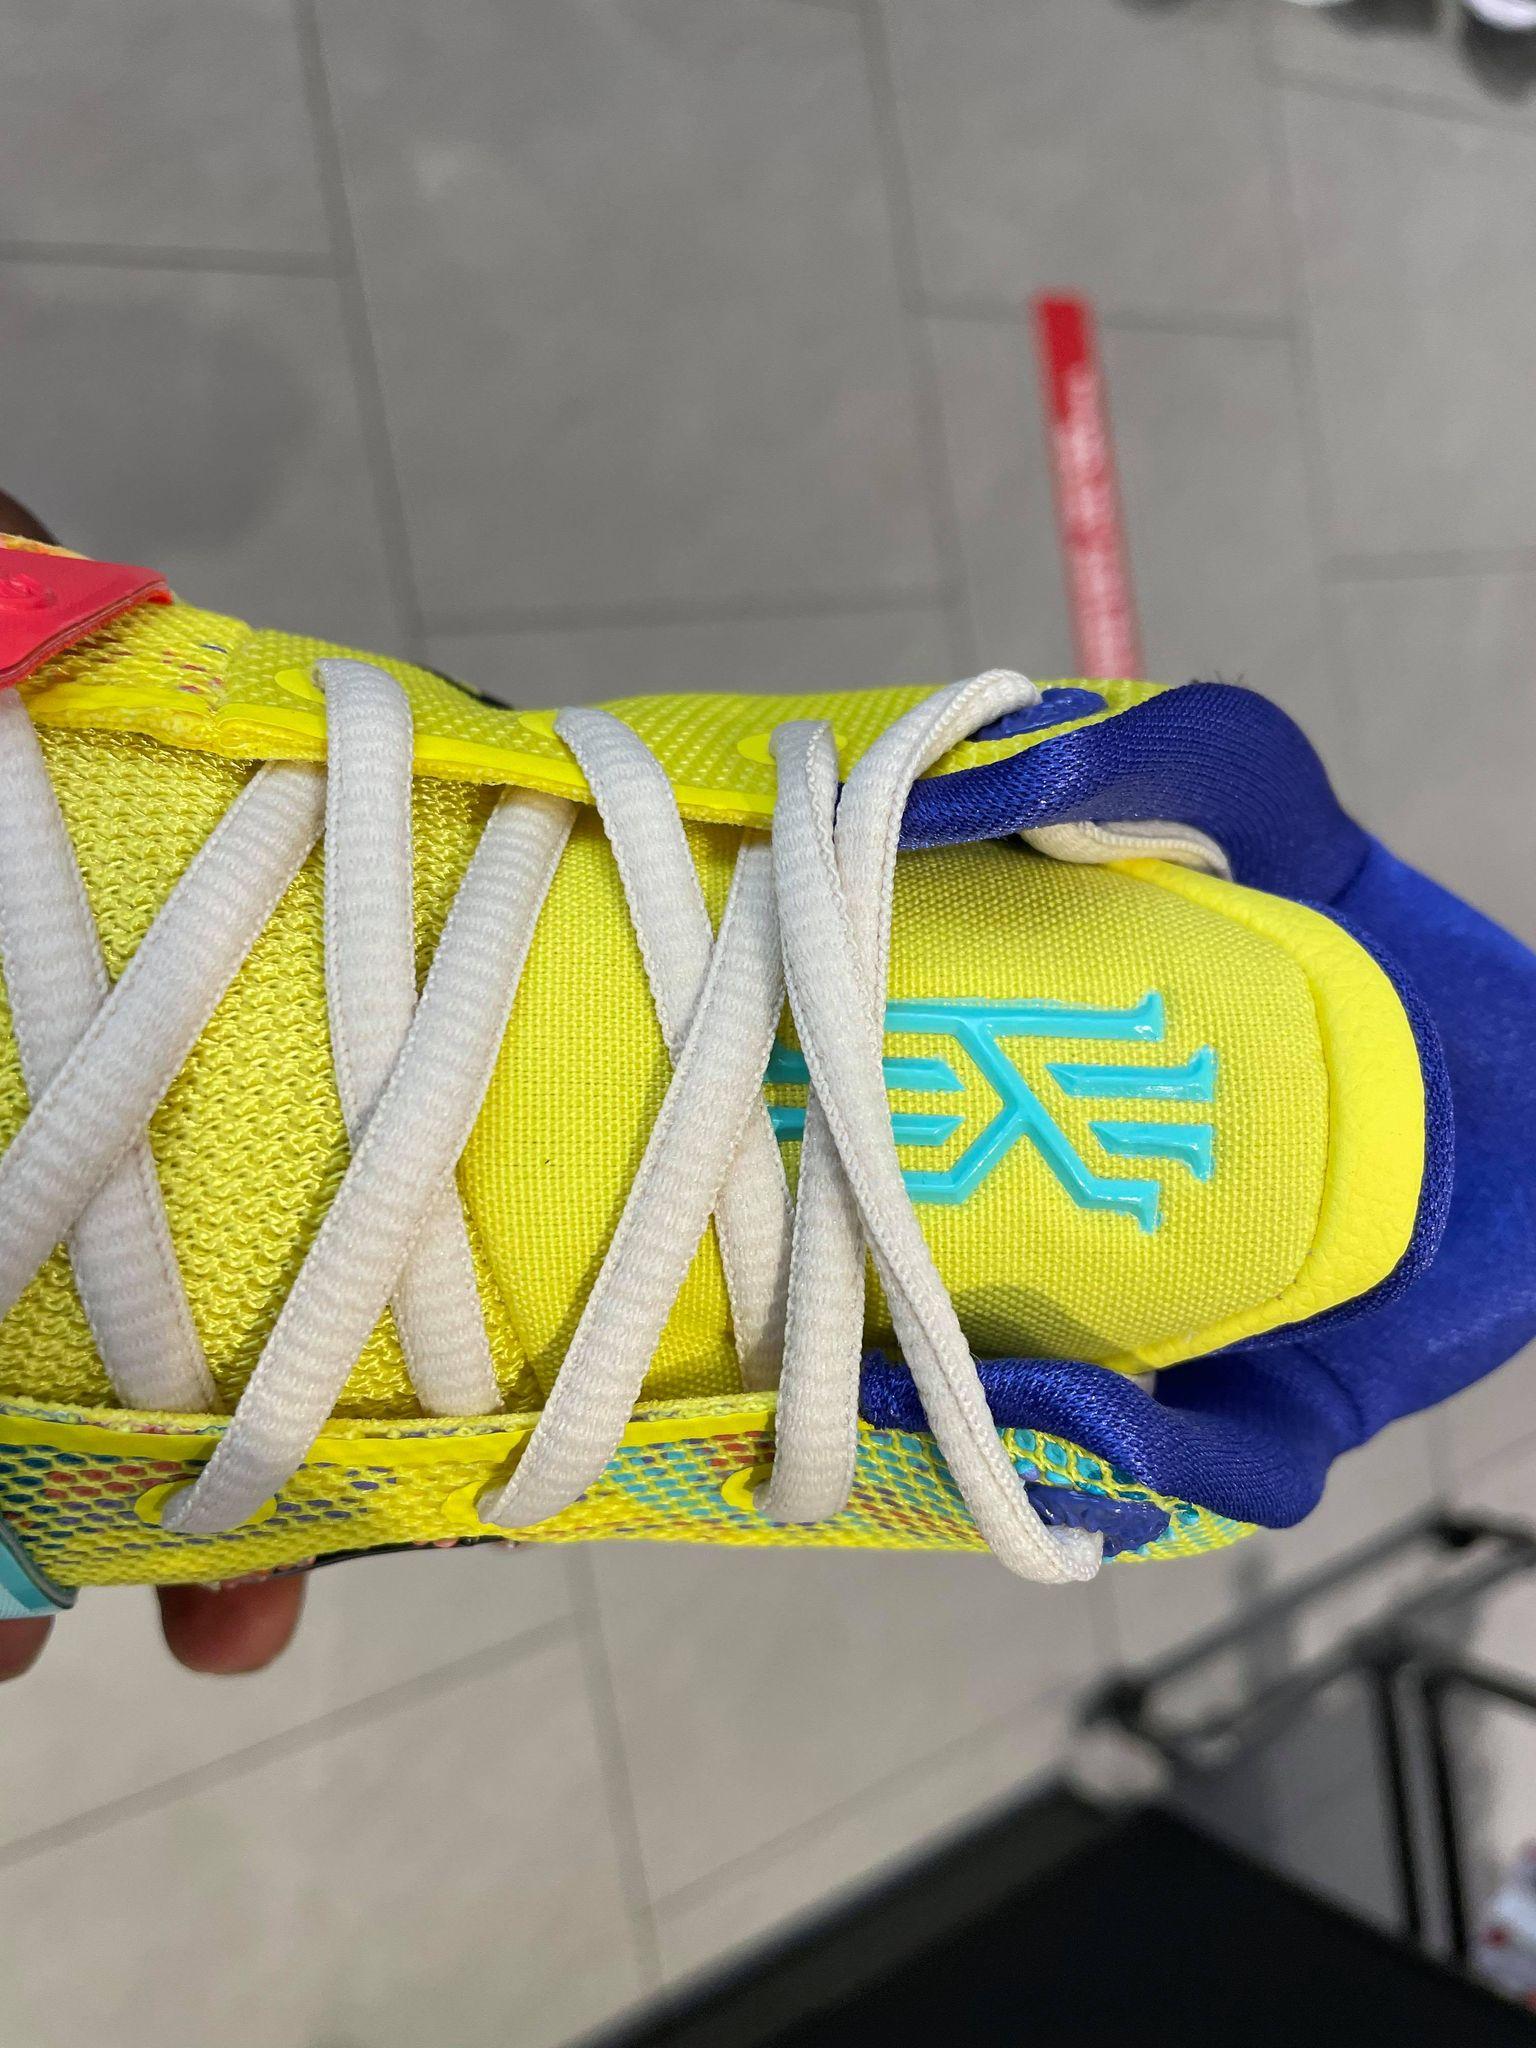 Nike kyrie 7 1 World 1 People CQ9326-700